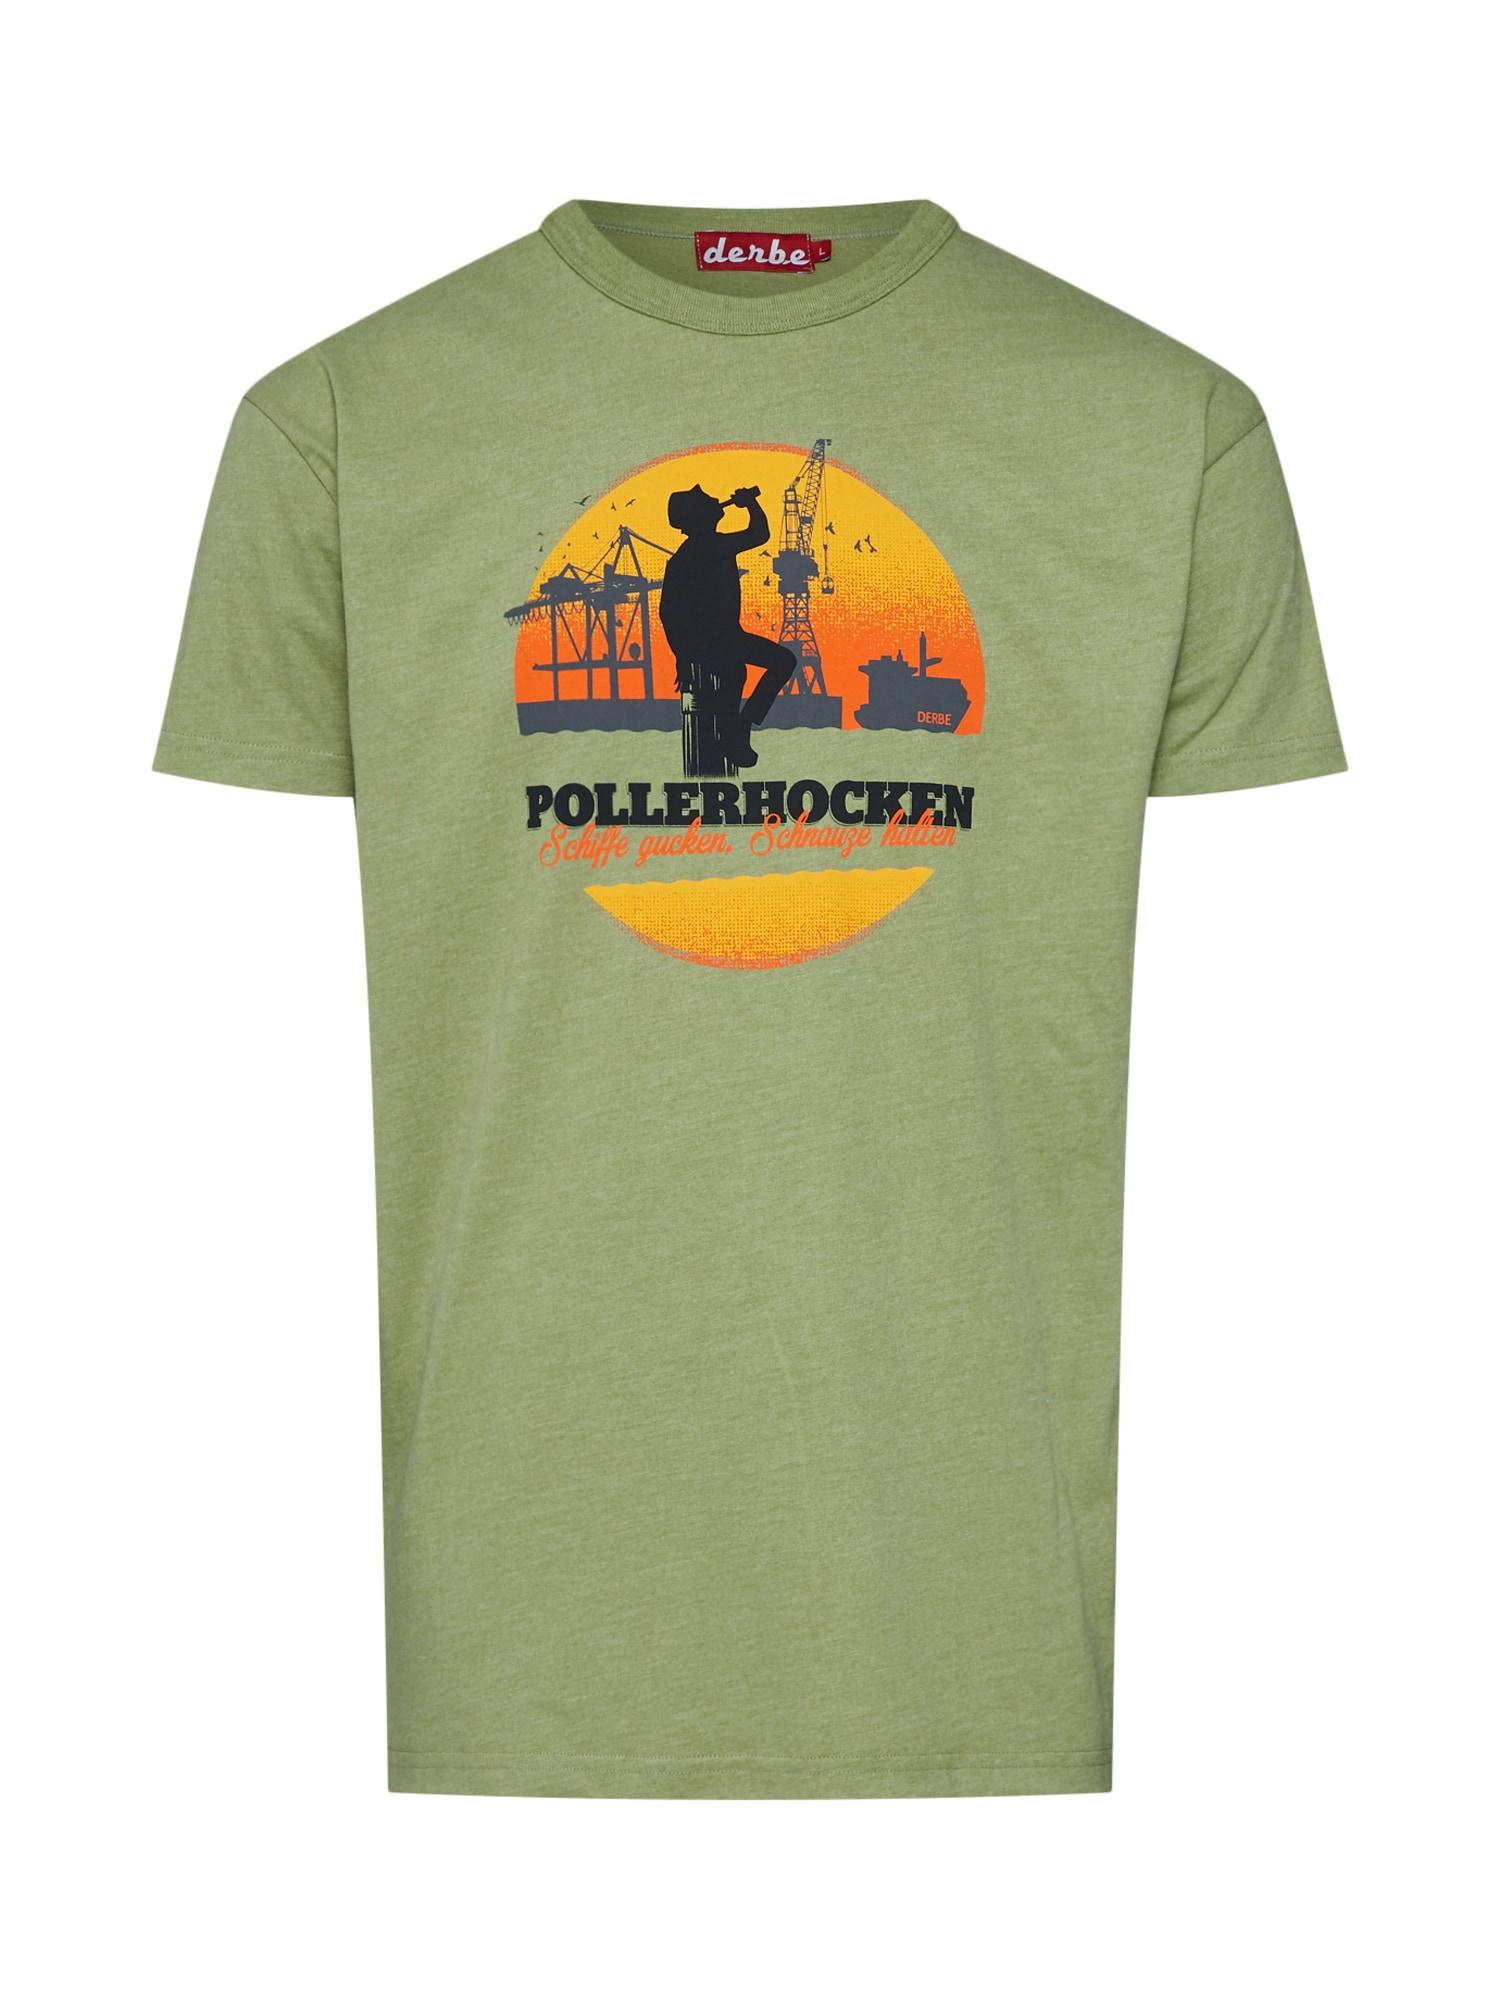 Tričko Pollerhocken zelený melír Derbe